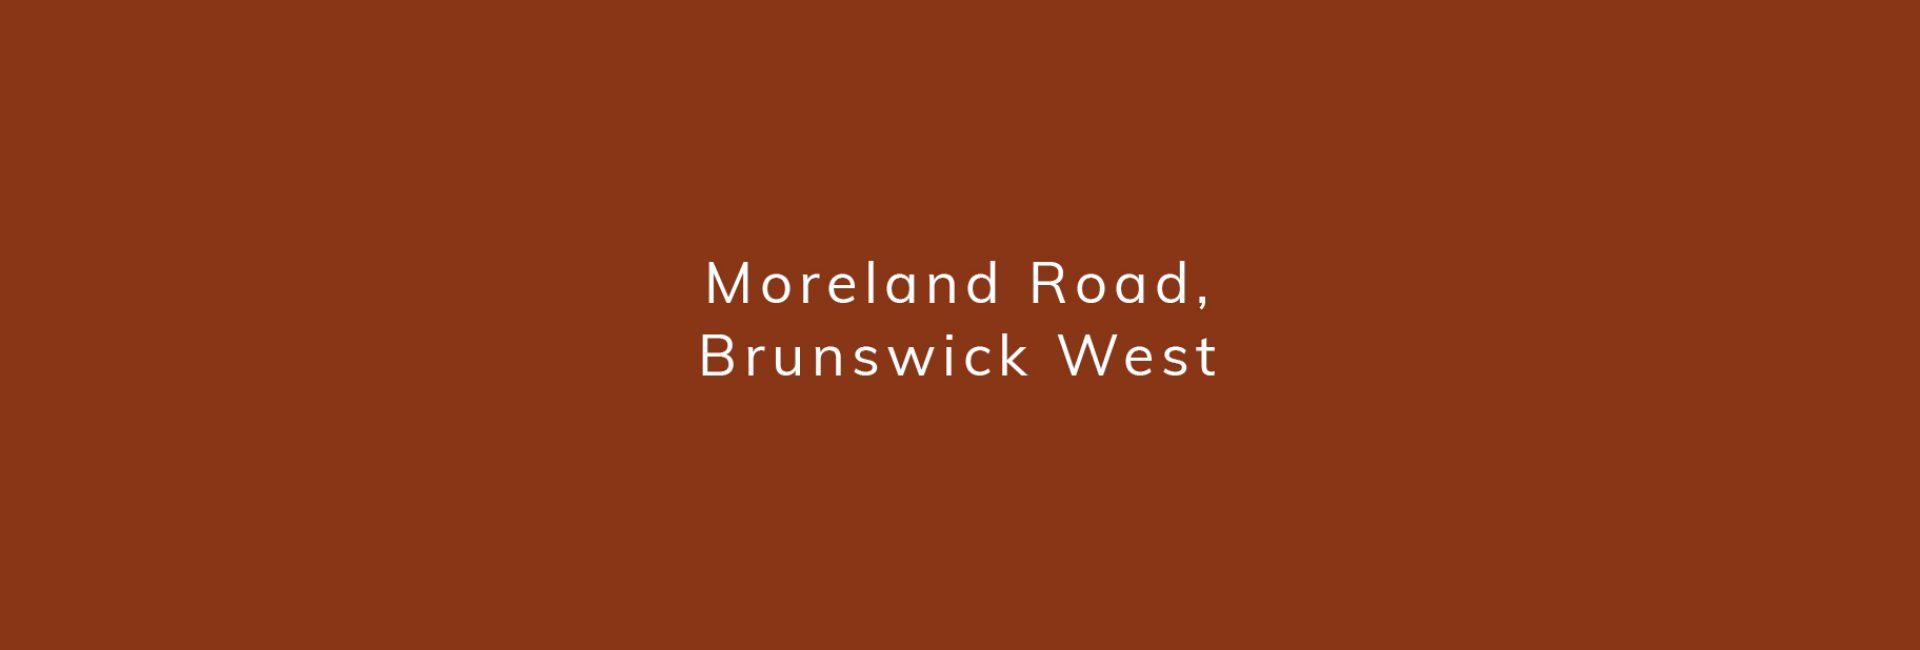 Moreland-road